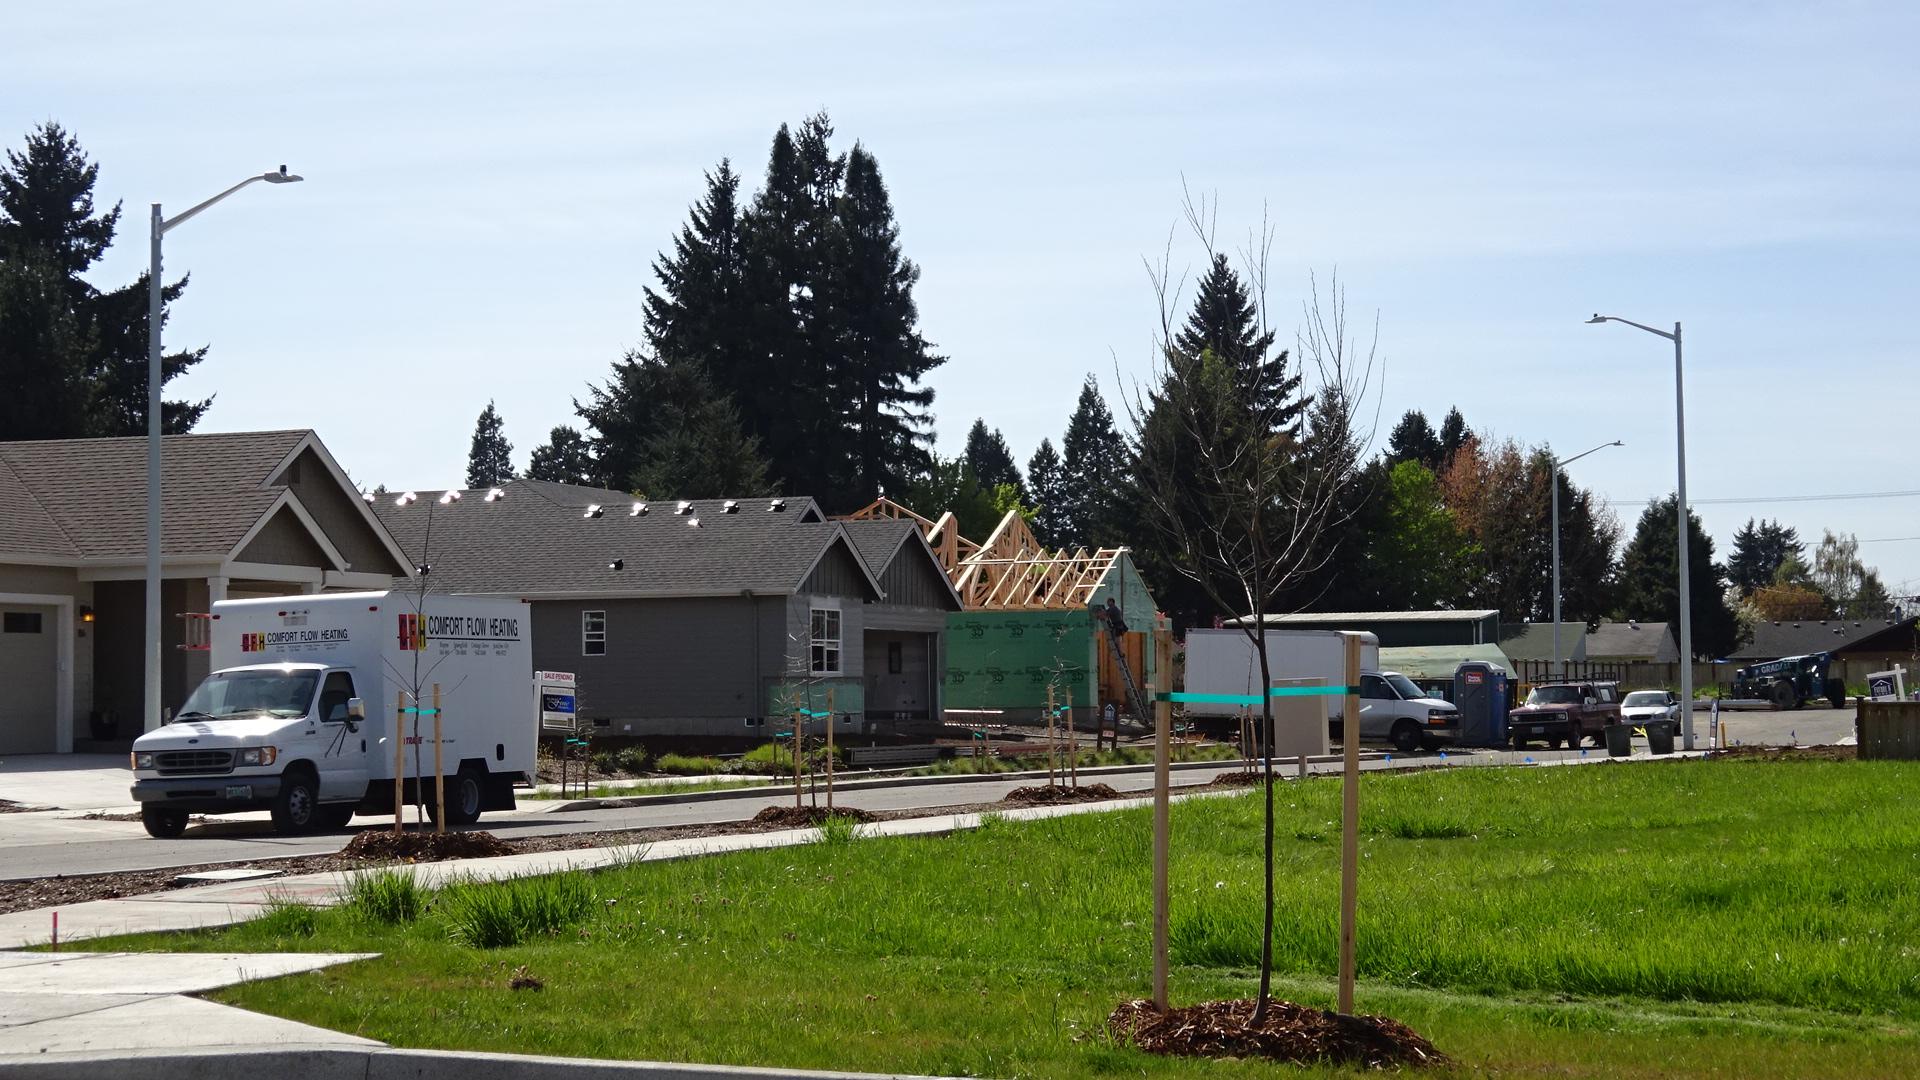 New homes for sale in eugene oregon new homes for sale in for Eugene oregon home builders